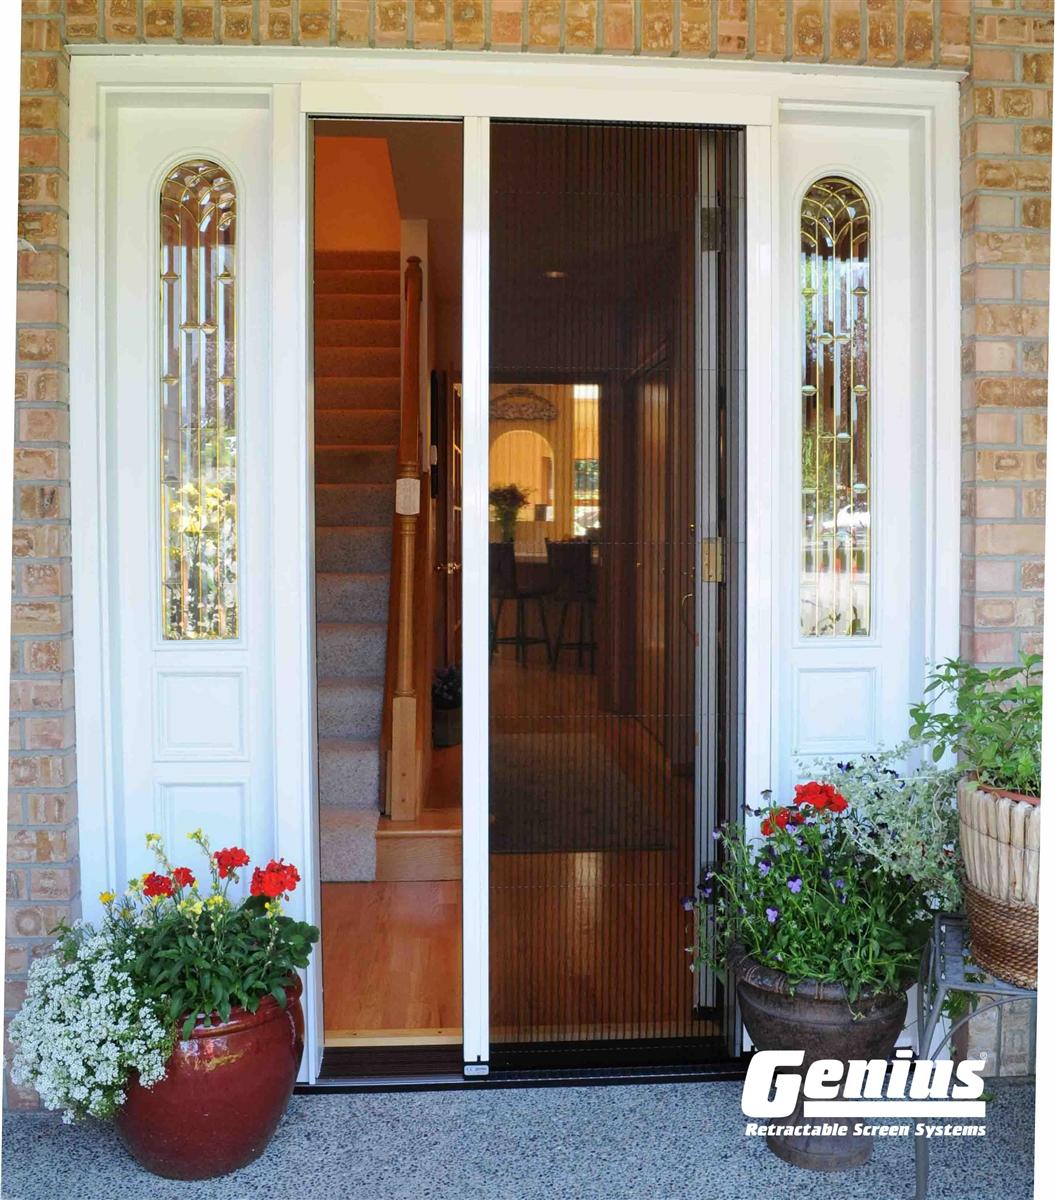 Genius sheer advance pleated re sizable retractable door for Disappearing screen door reviews